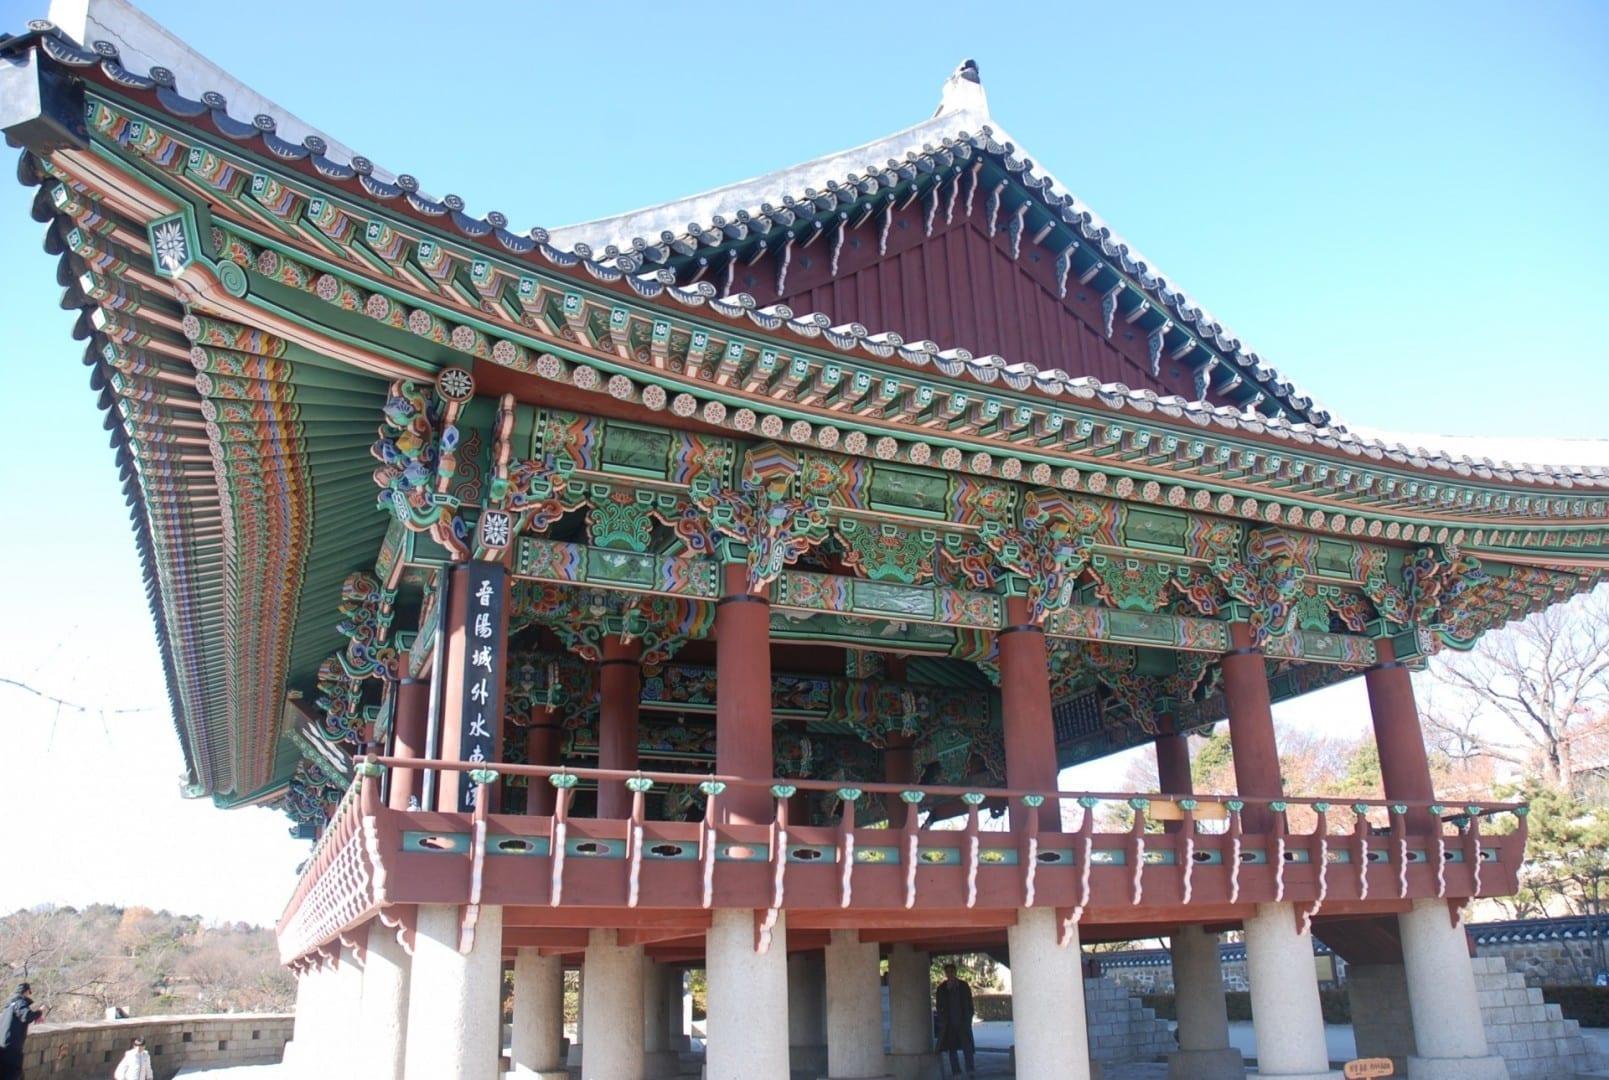 Pabellón Choksuk, la sede del Sur en la Fortaleza Jinju. Jinju Corea del Sur